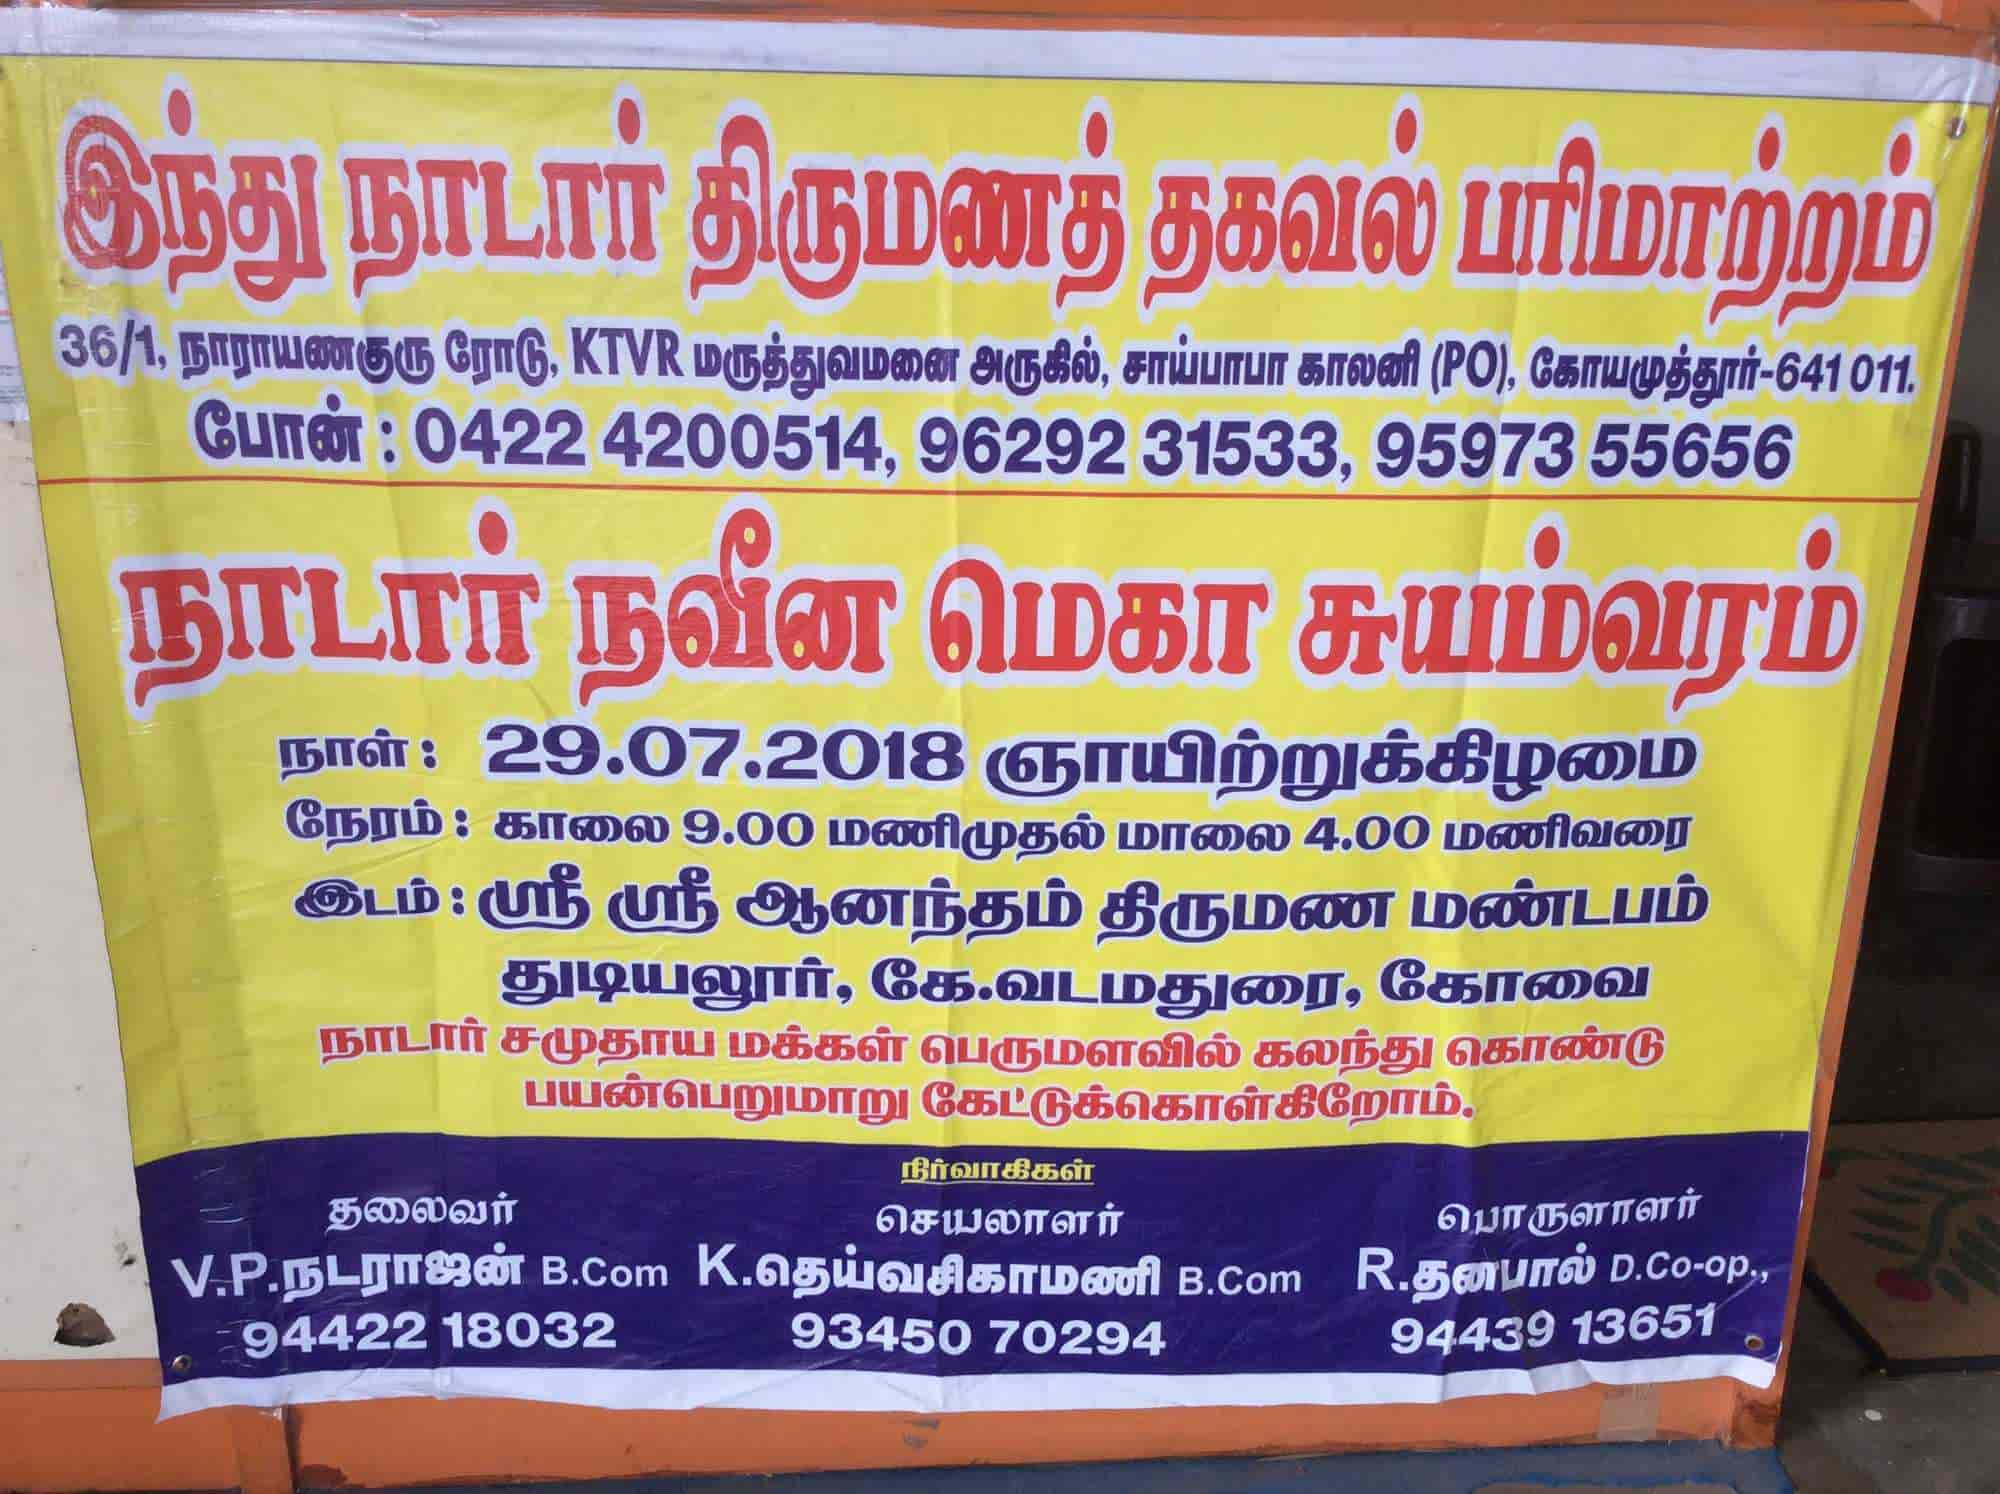 Hindu Nadar Marriage Information Center, Saibaba Colony